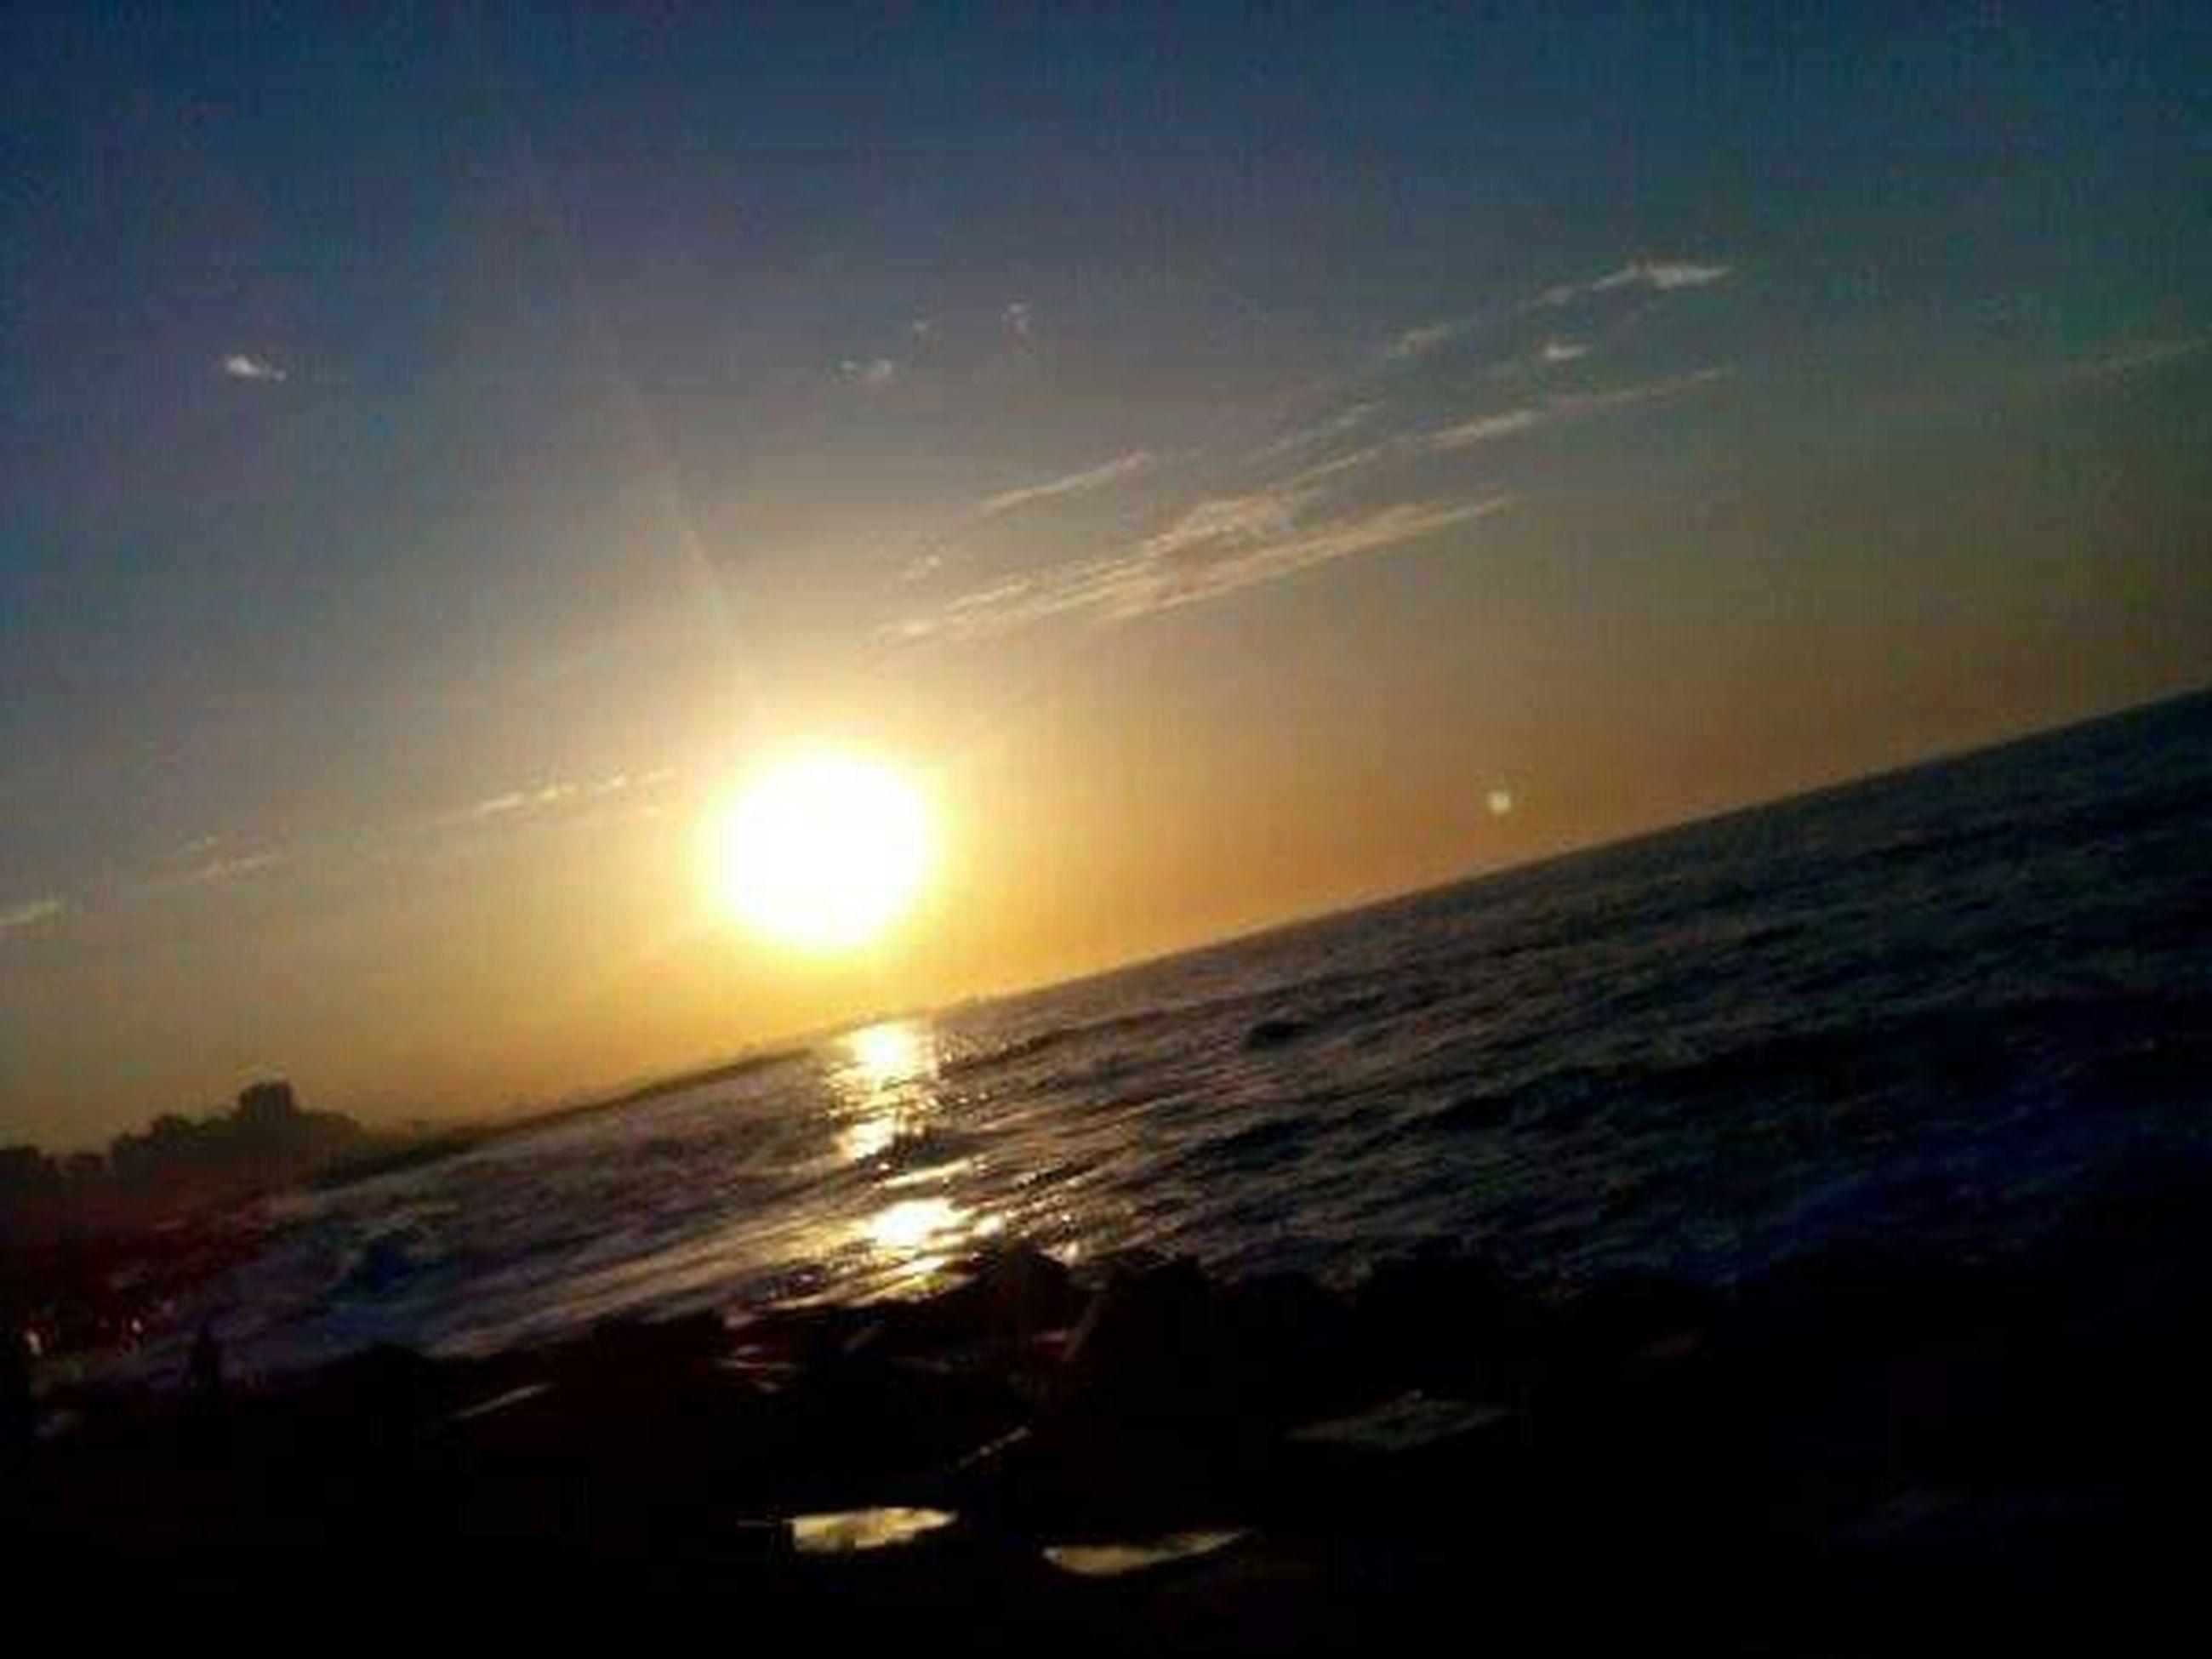 sunset, sea, sun, horizon over water, water, scenics, tranquil scene, beauty in nature, tranquility, sky, idyllic, orange color, nature, beach, reflection, sunlight, shore, sunbeam, outdoors, seascape